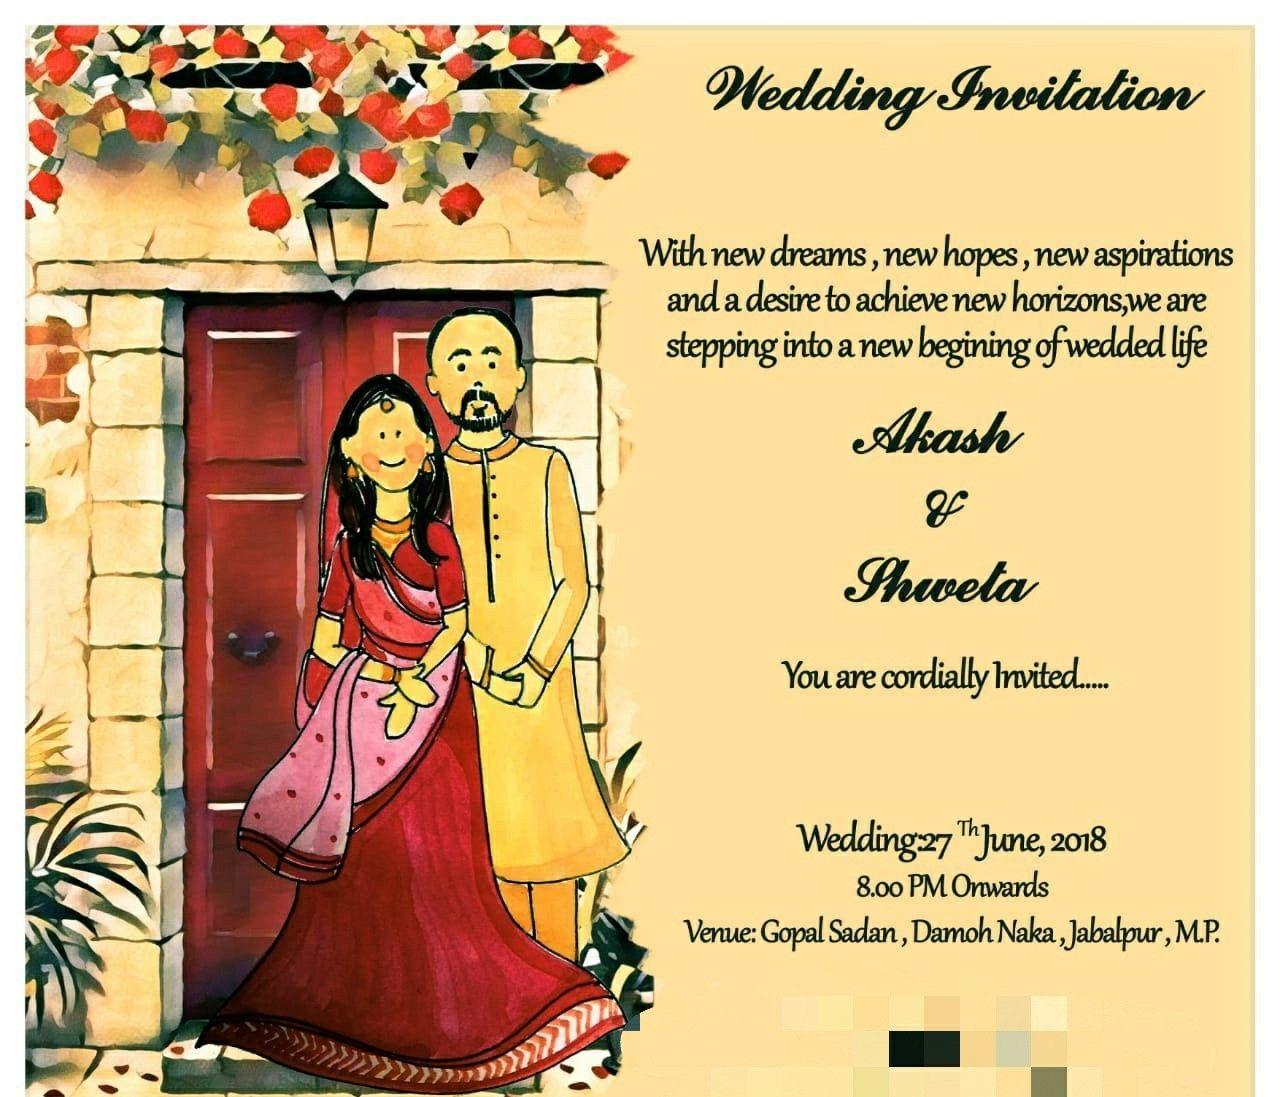 Pin By Sugandha Rao On Wedding New Hope Jabalpur Life